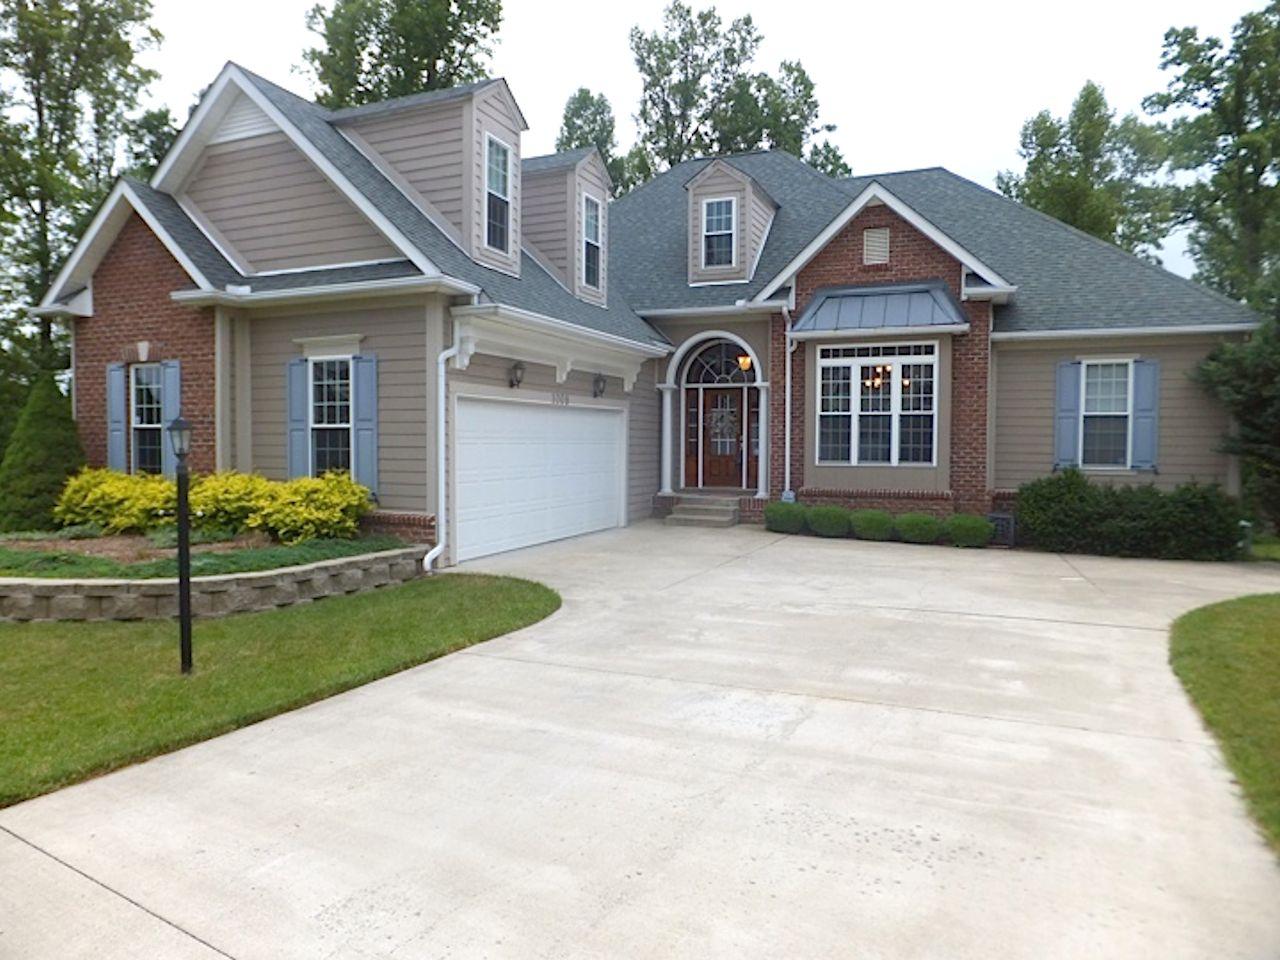 1008 Red Maple Ridge, Ashland, Kentucky 41102